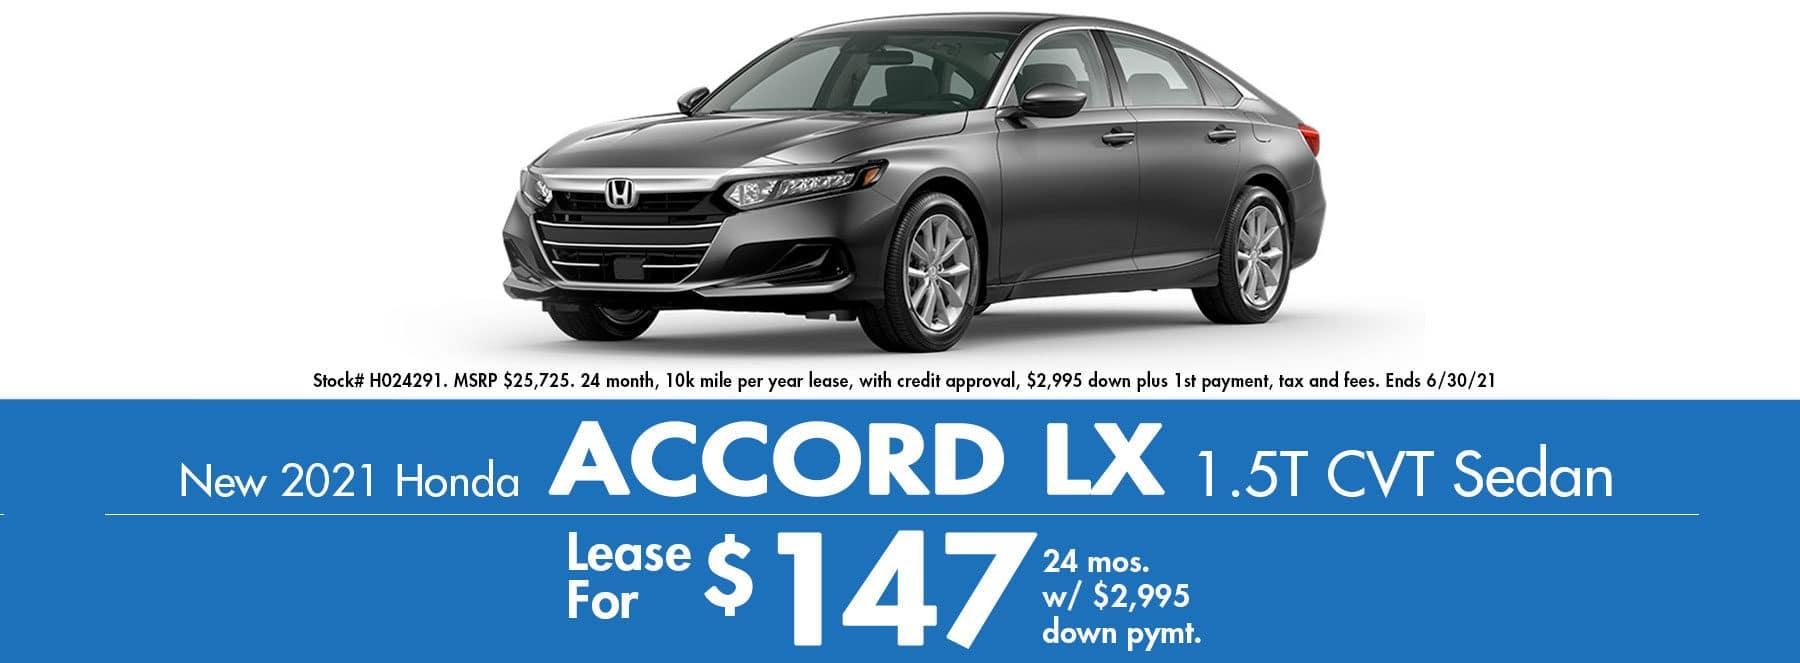 2021 Honda Accord LX $147 / Month!